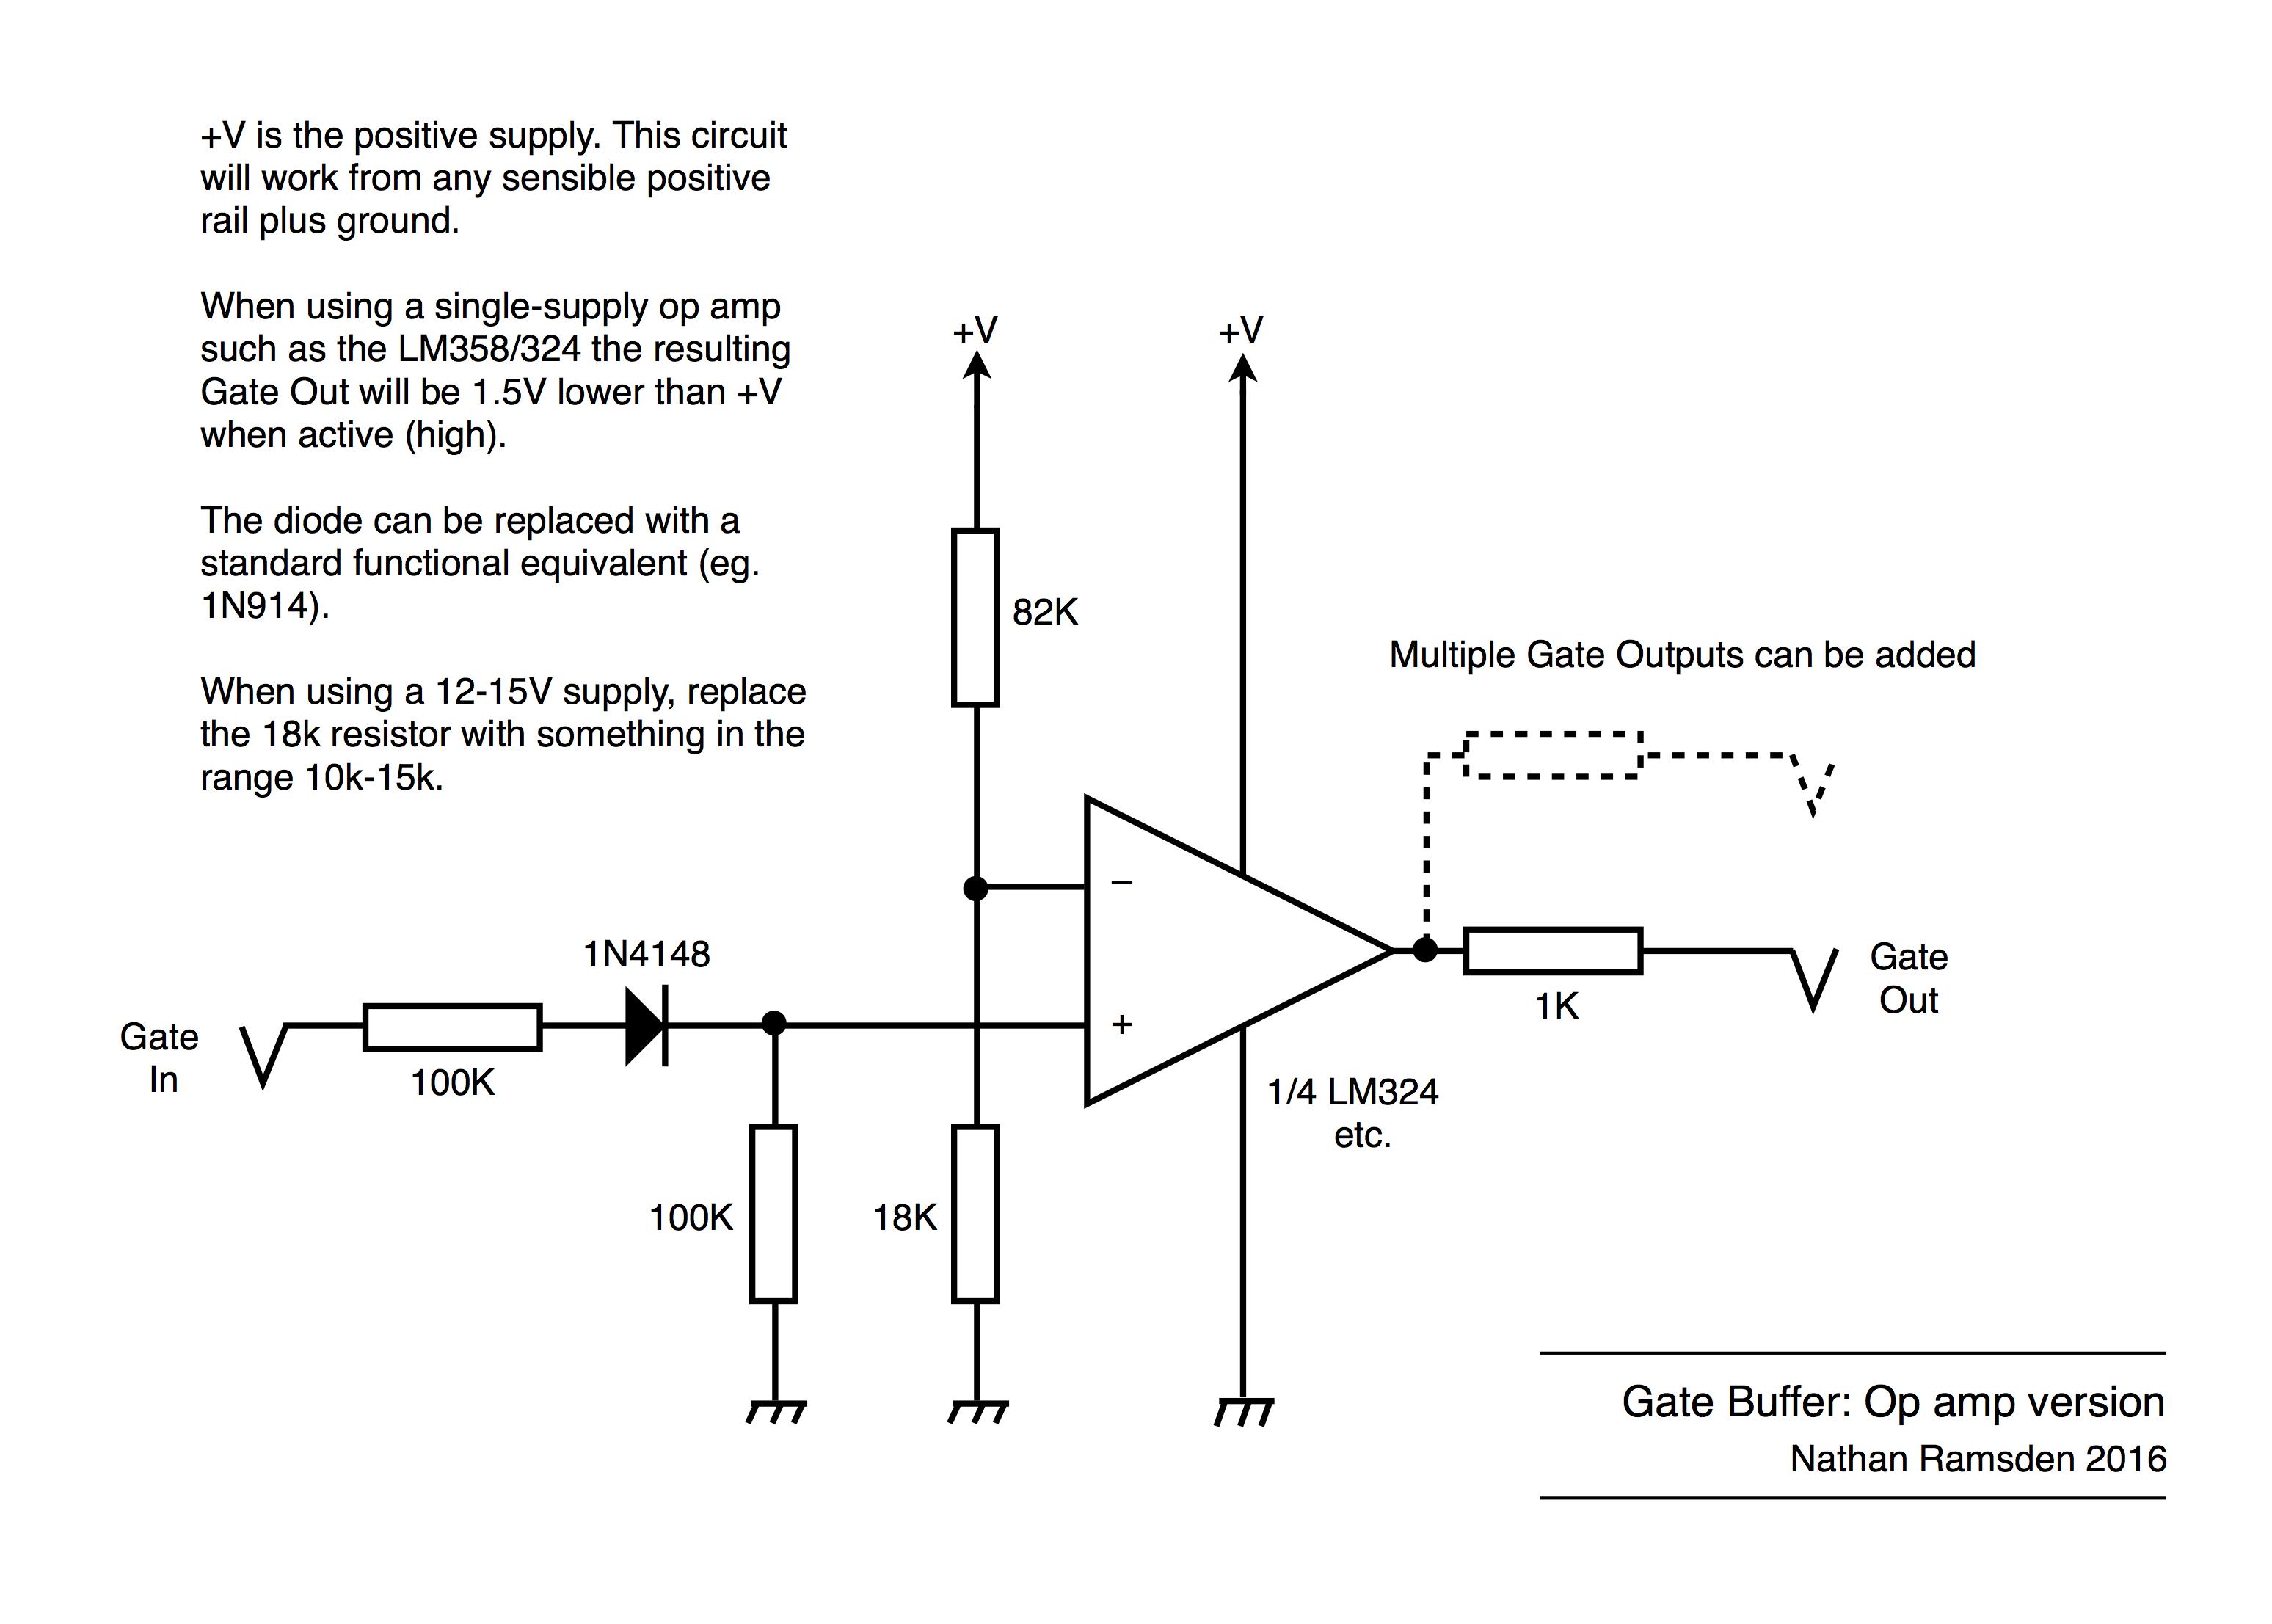 Buffer Op Amp Diagram House Wiring Symbols Discrete Synthnerd Rh Wordpress Com Basic Amps Circuits Inveting